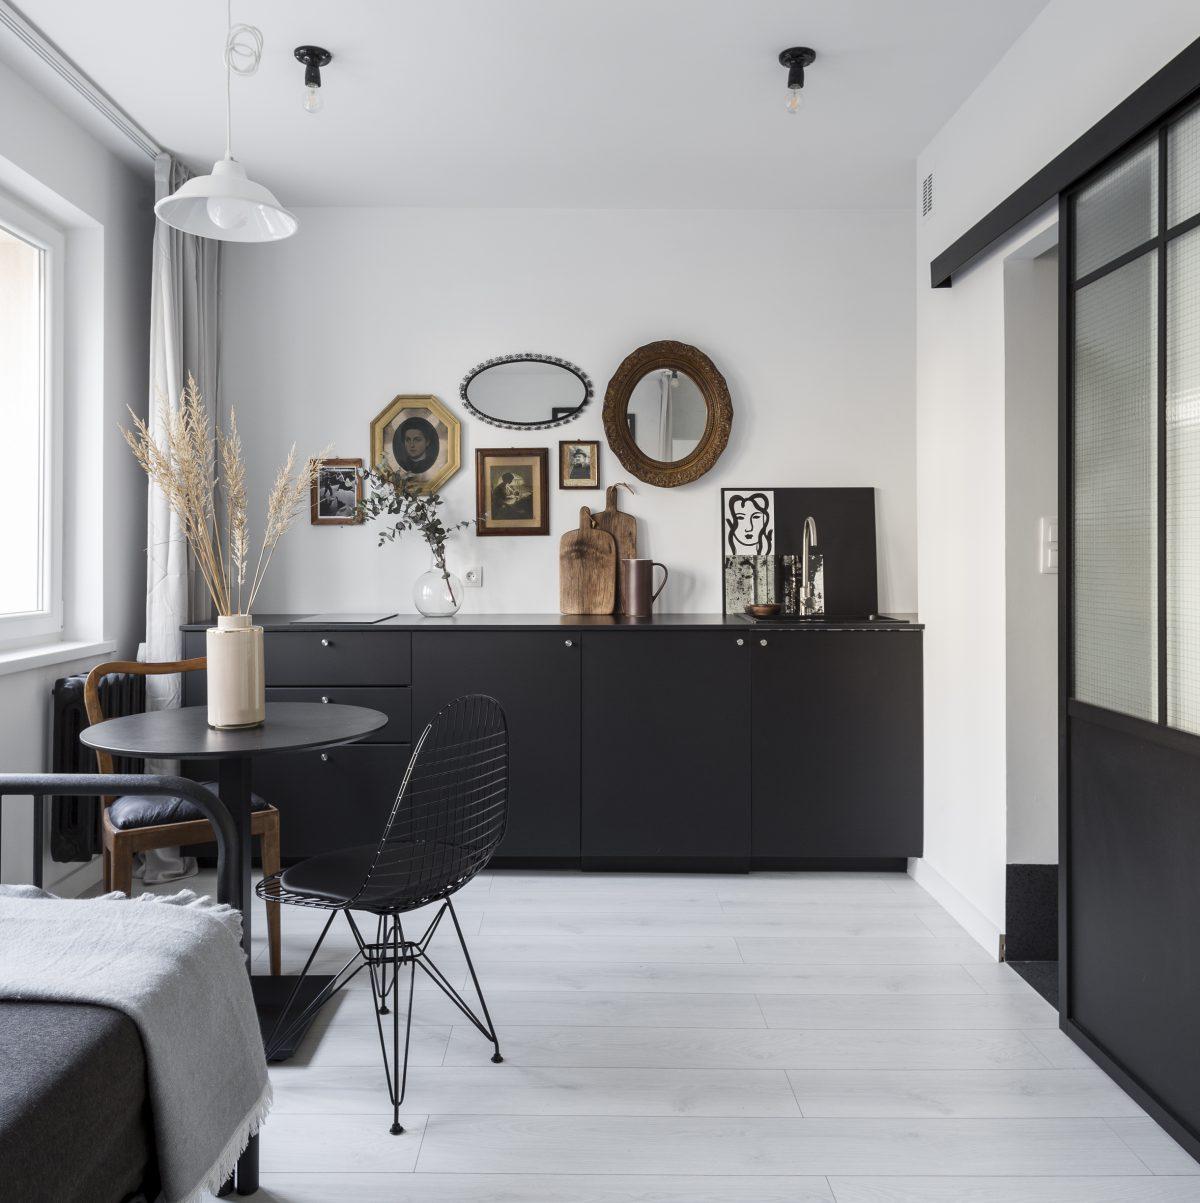 Czarna kuchnia z mini galerią (proj. Nadia Mitłosz)